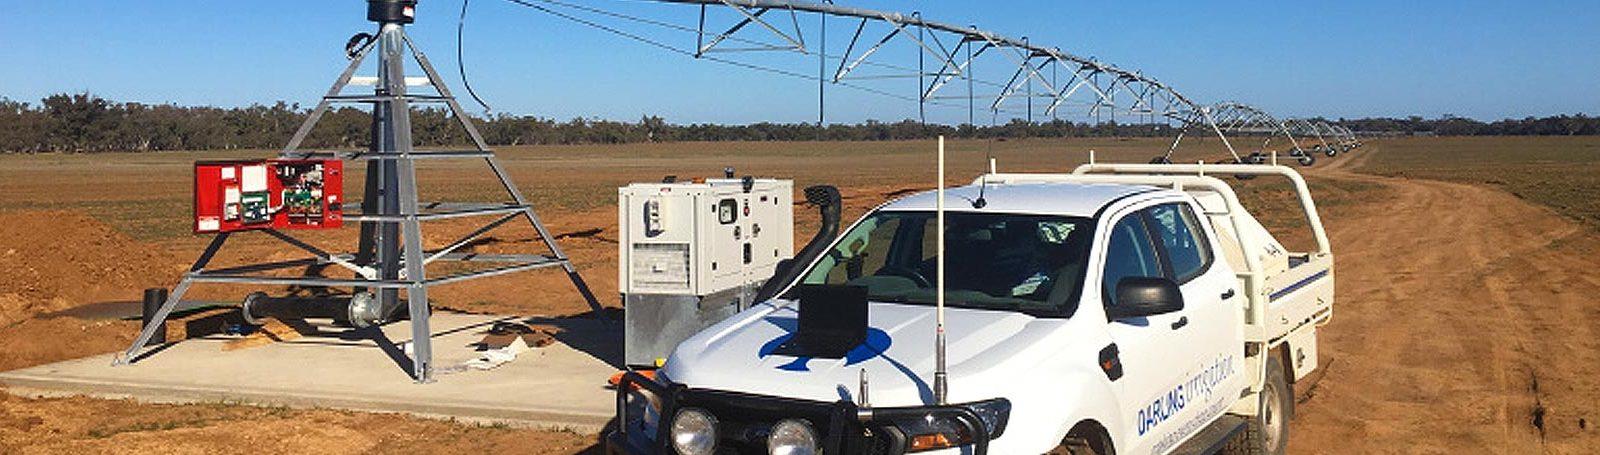 Darling Irrigation Service and Maintenance